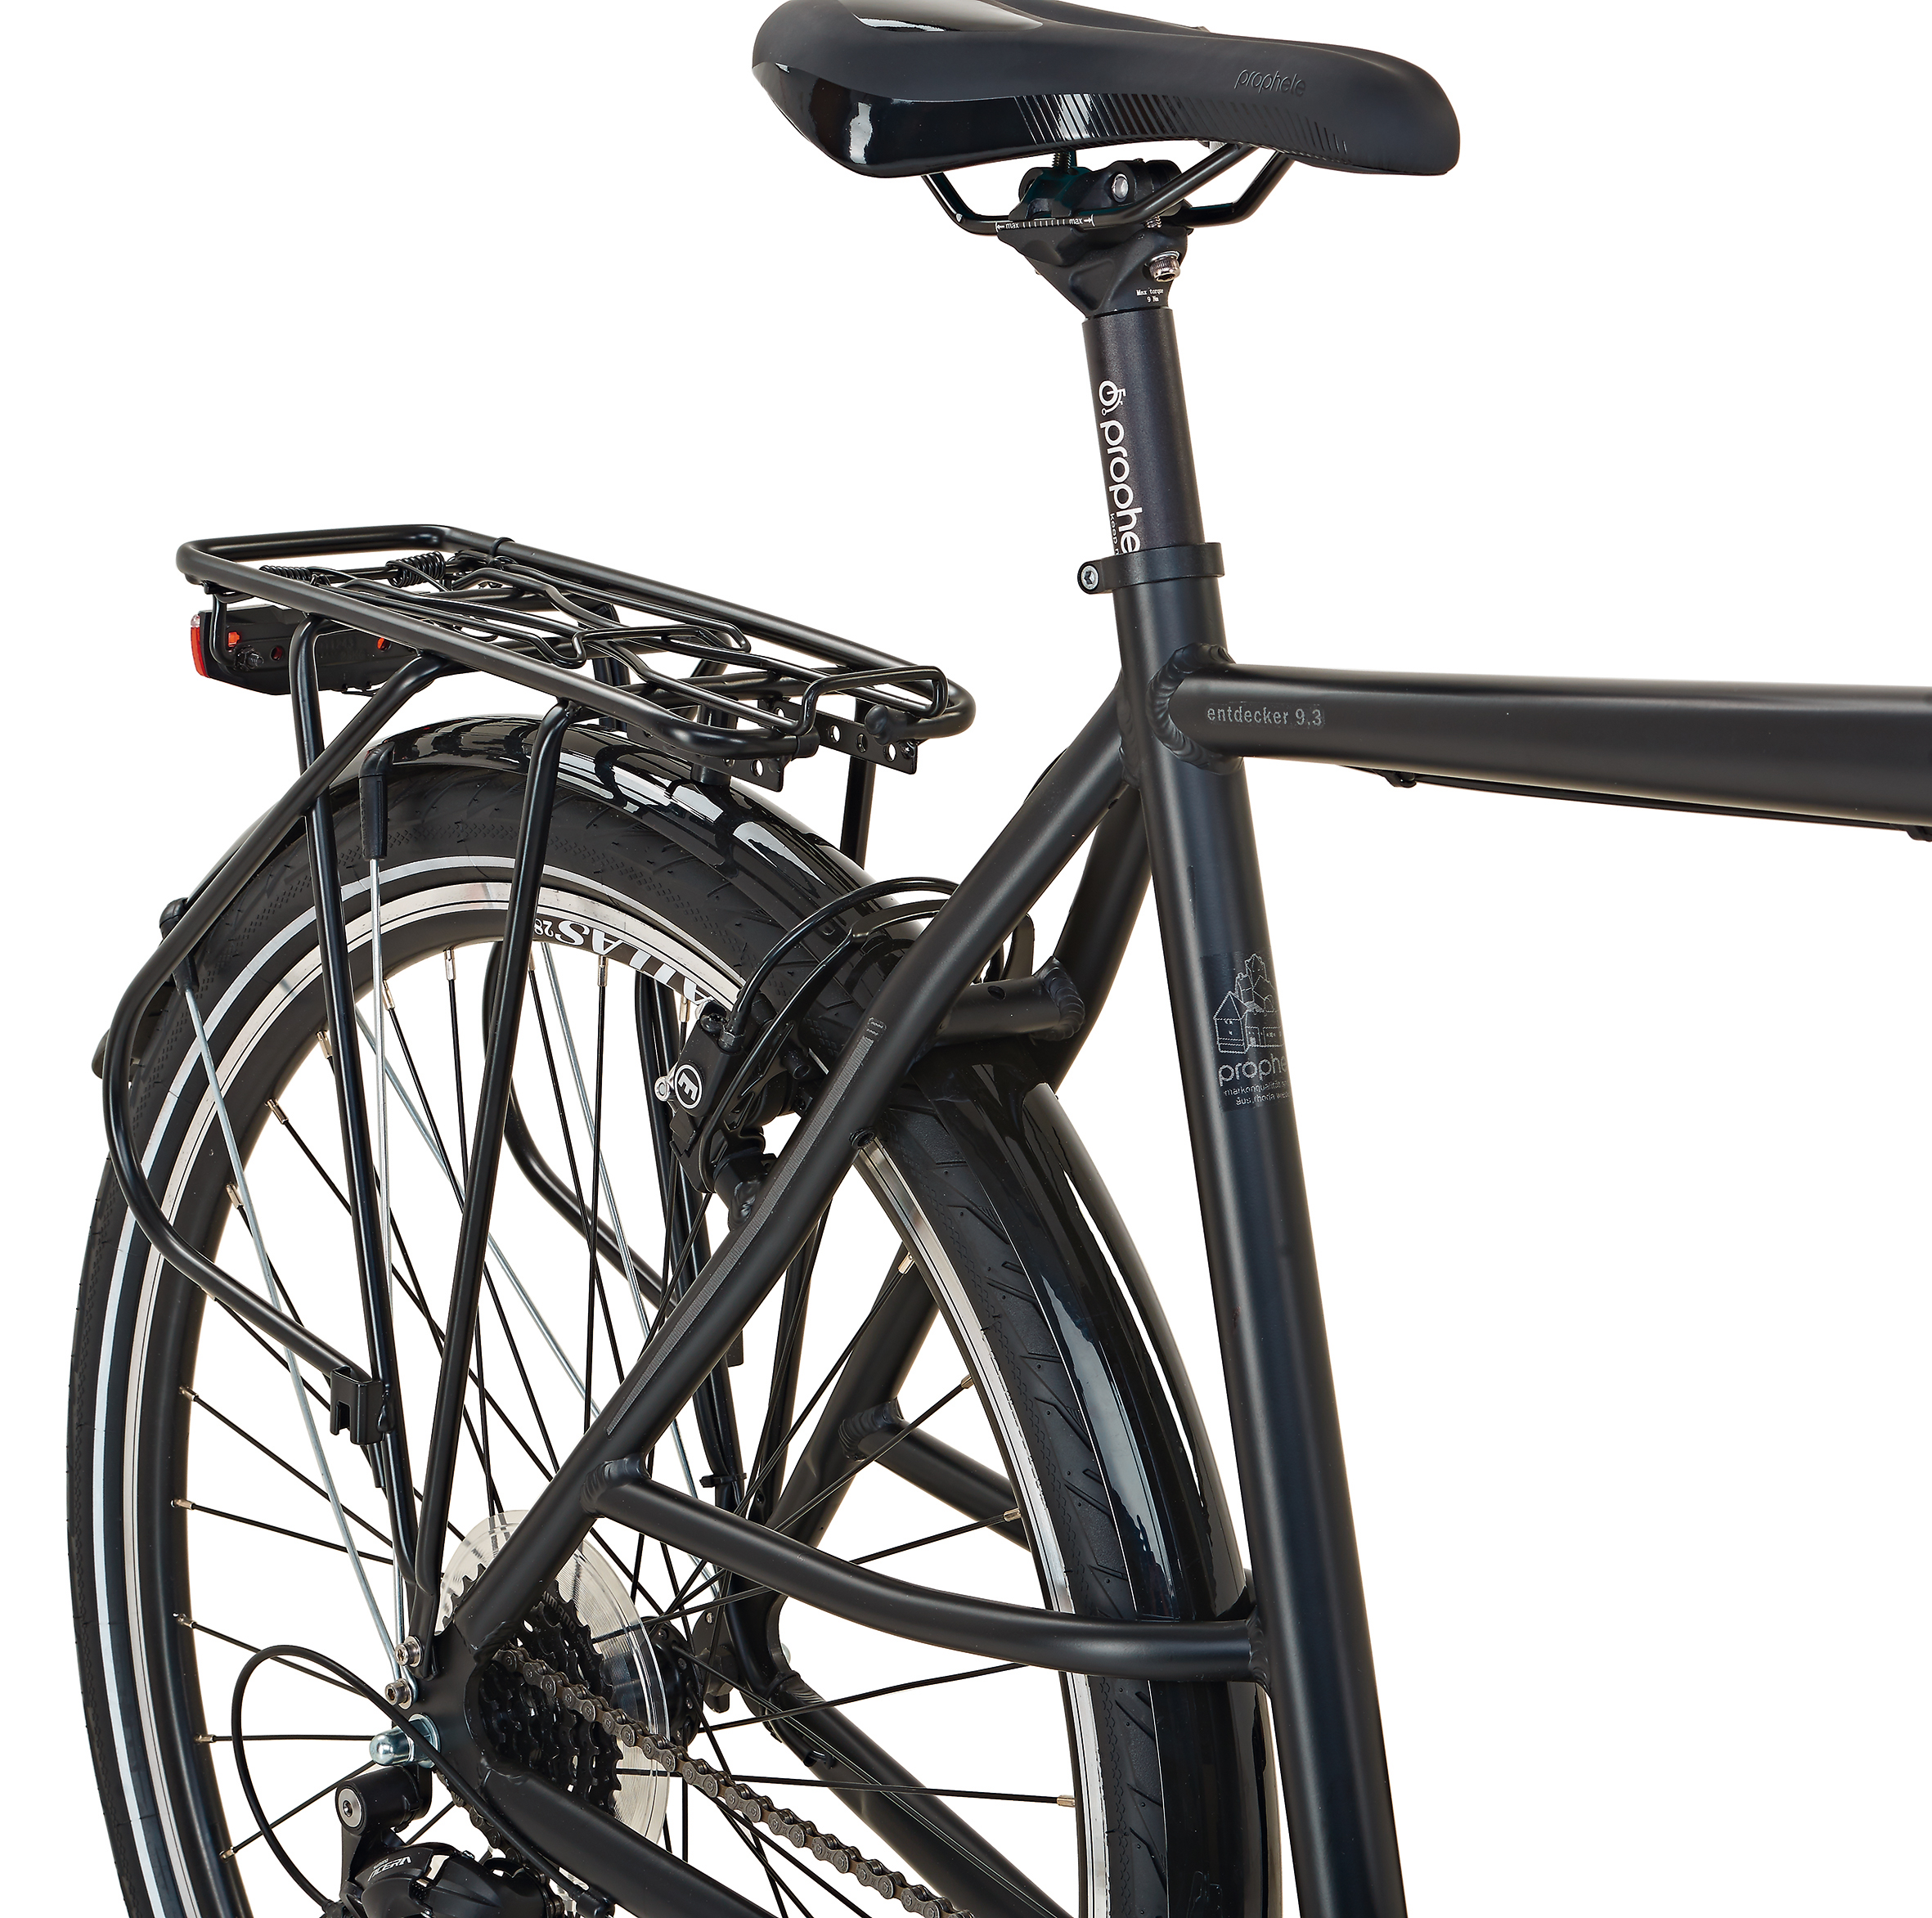 "Prophete Fahrrad / Trekkingrad Entdecker 9.3 Trekking Bike 28"" Herren Bild 6"